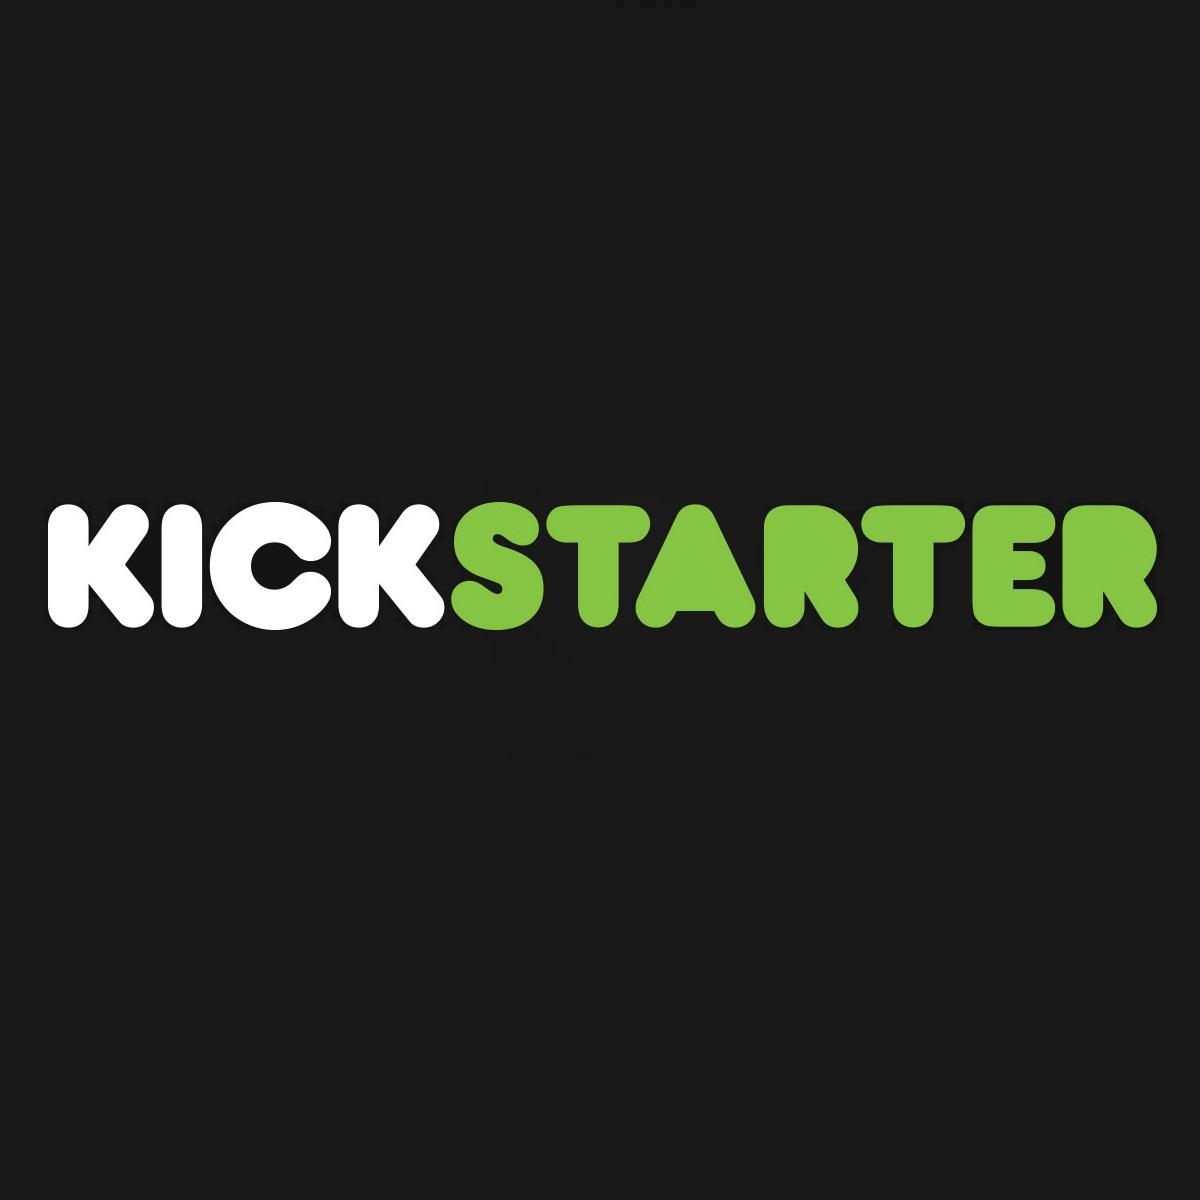 Kickstarter Clone Script